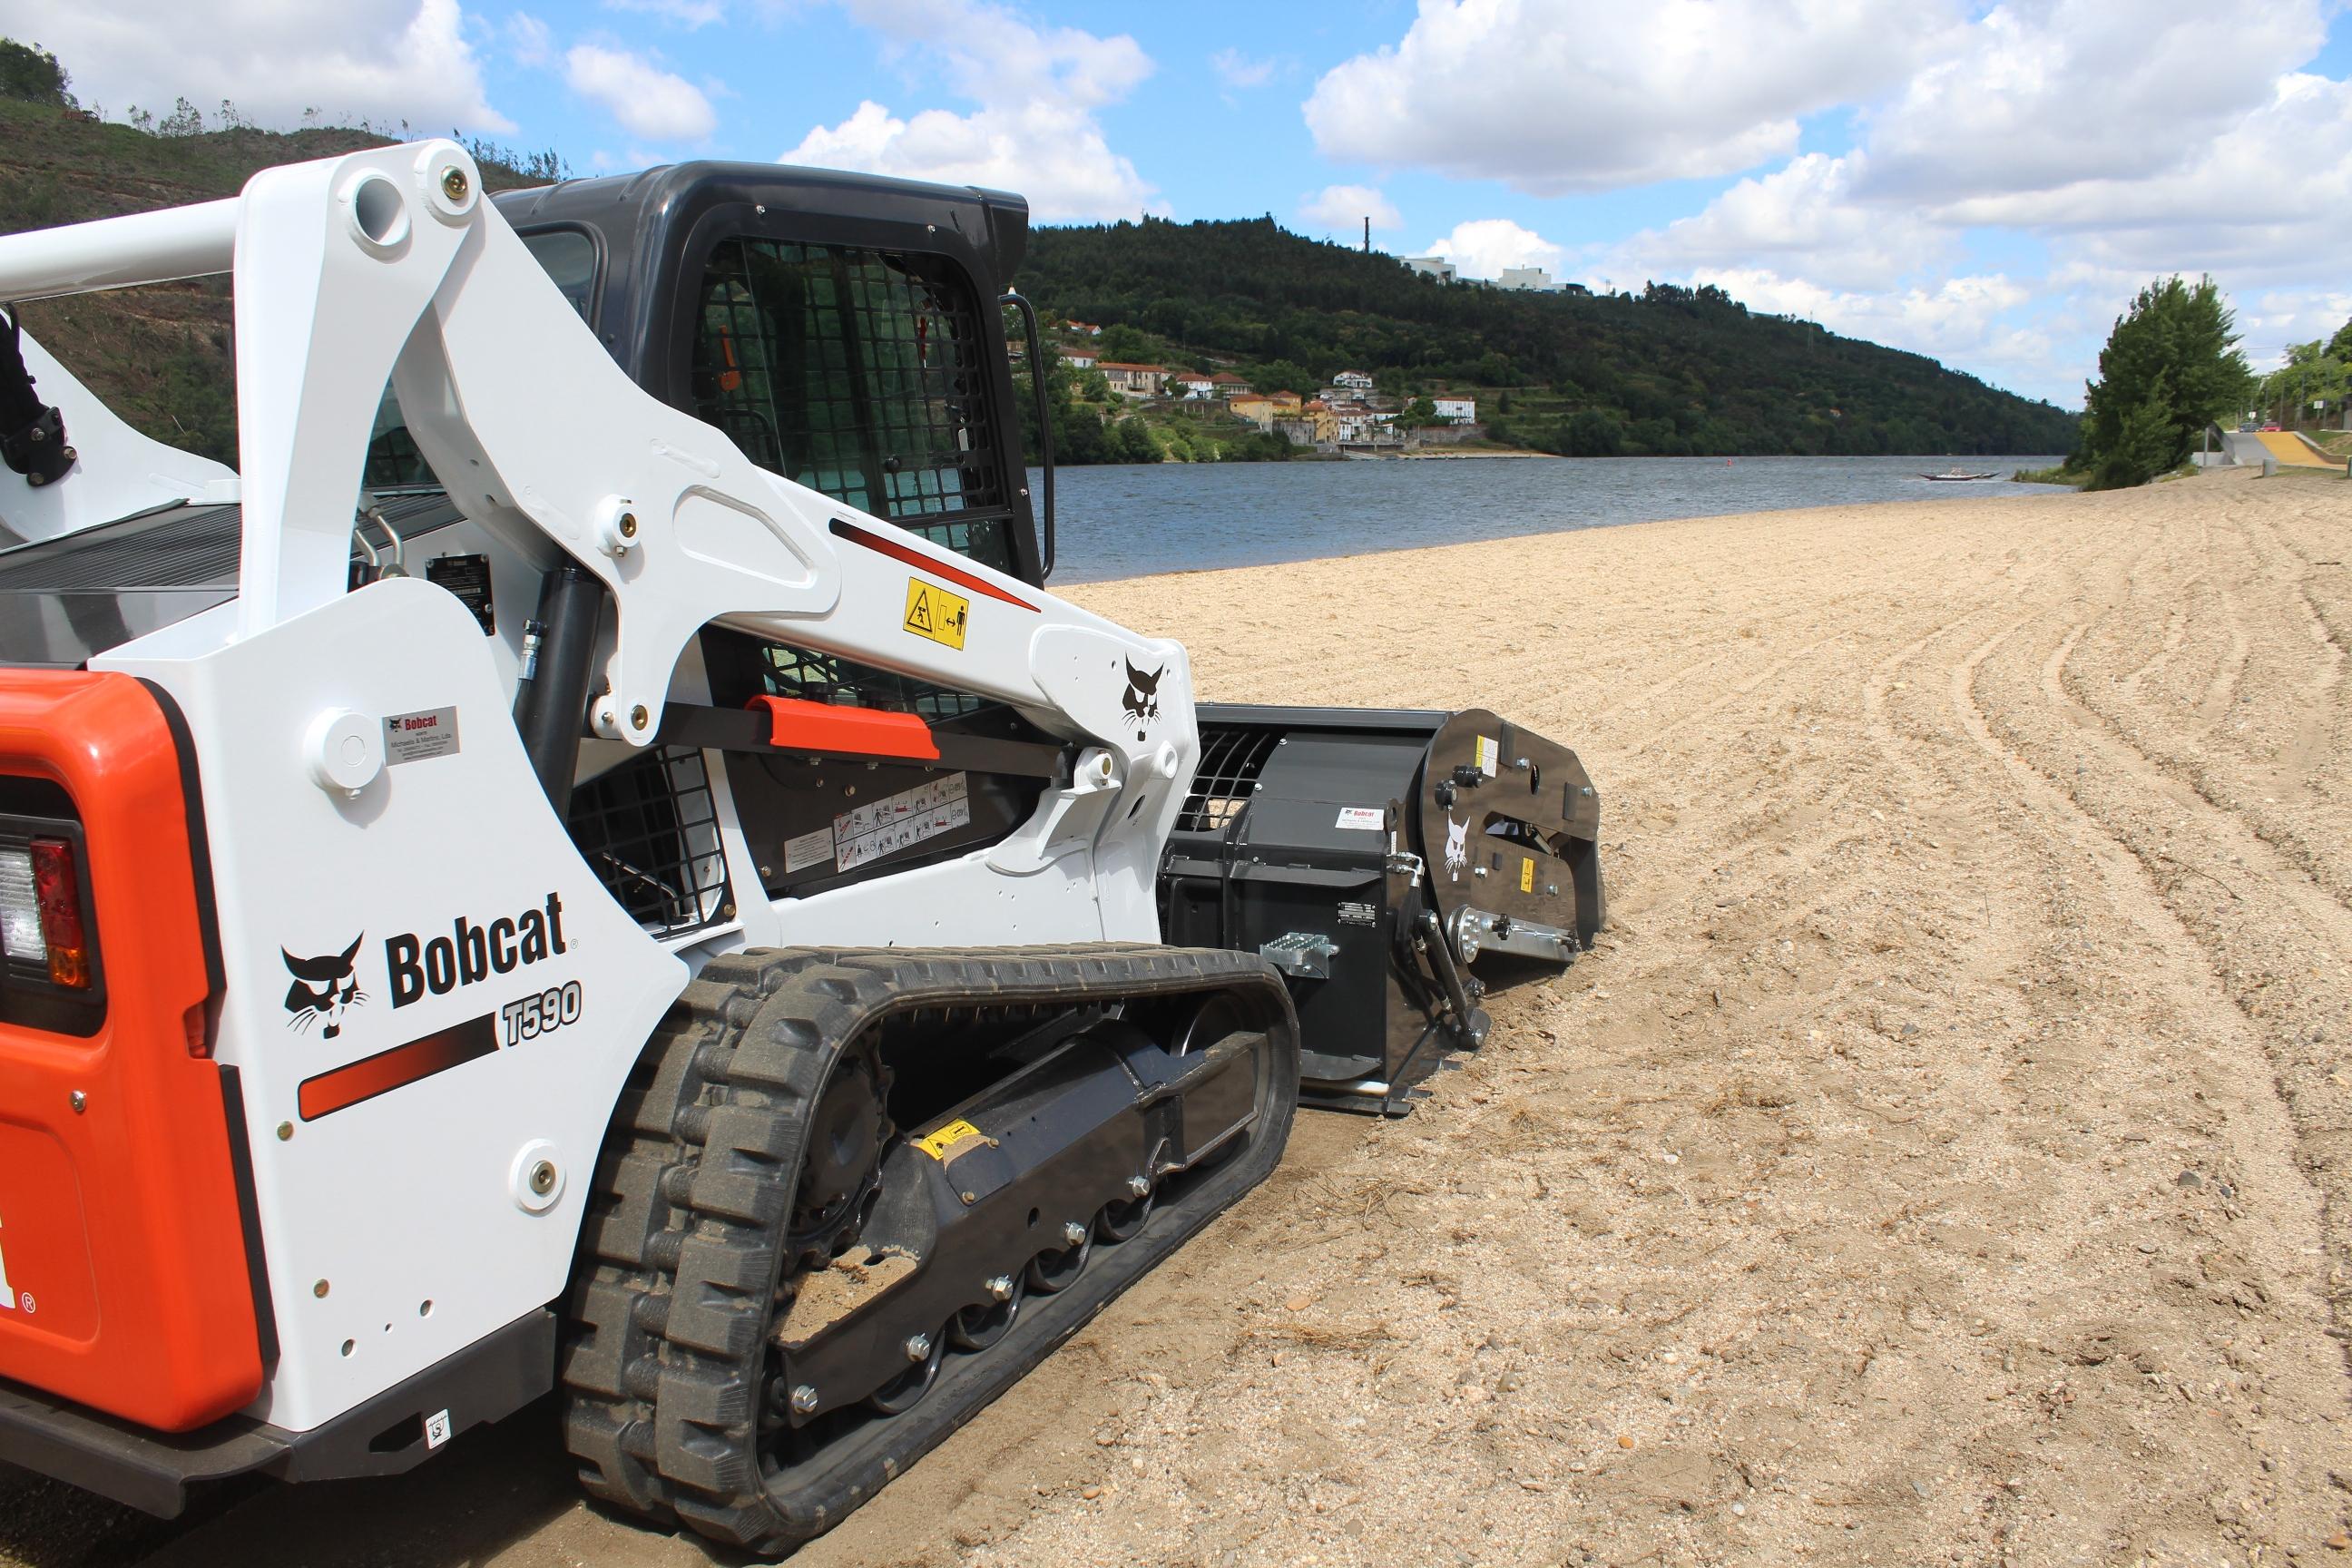 Bobcat Attachment Cleans Douro River Beaches